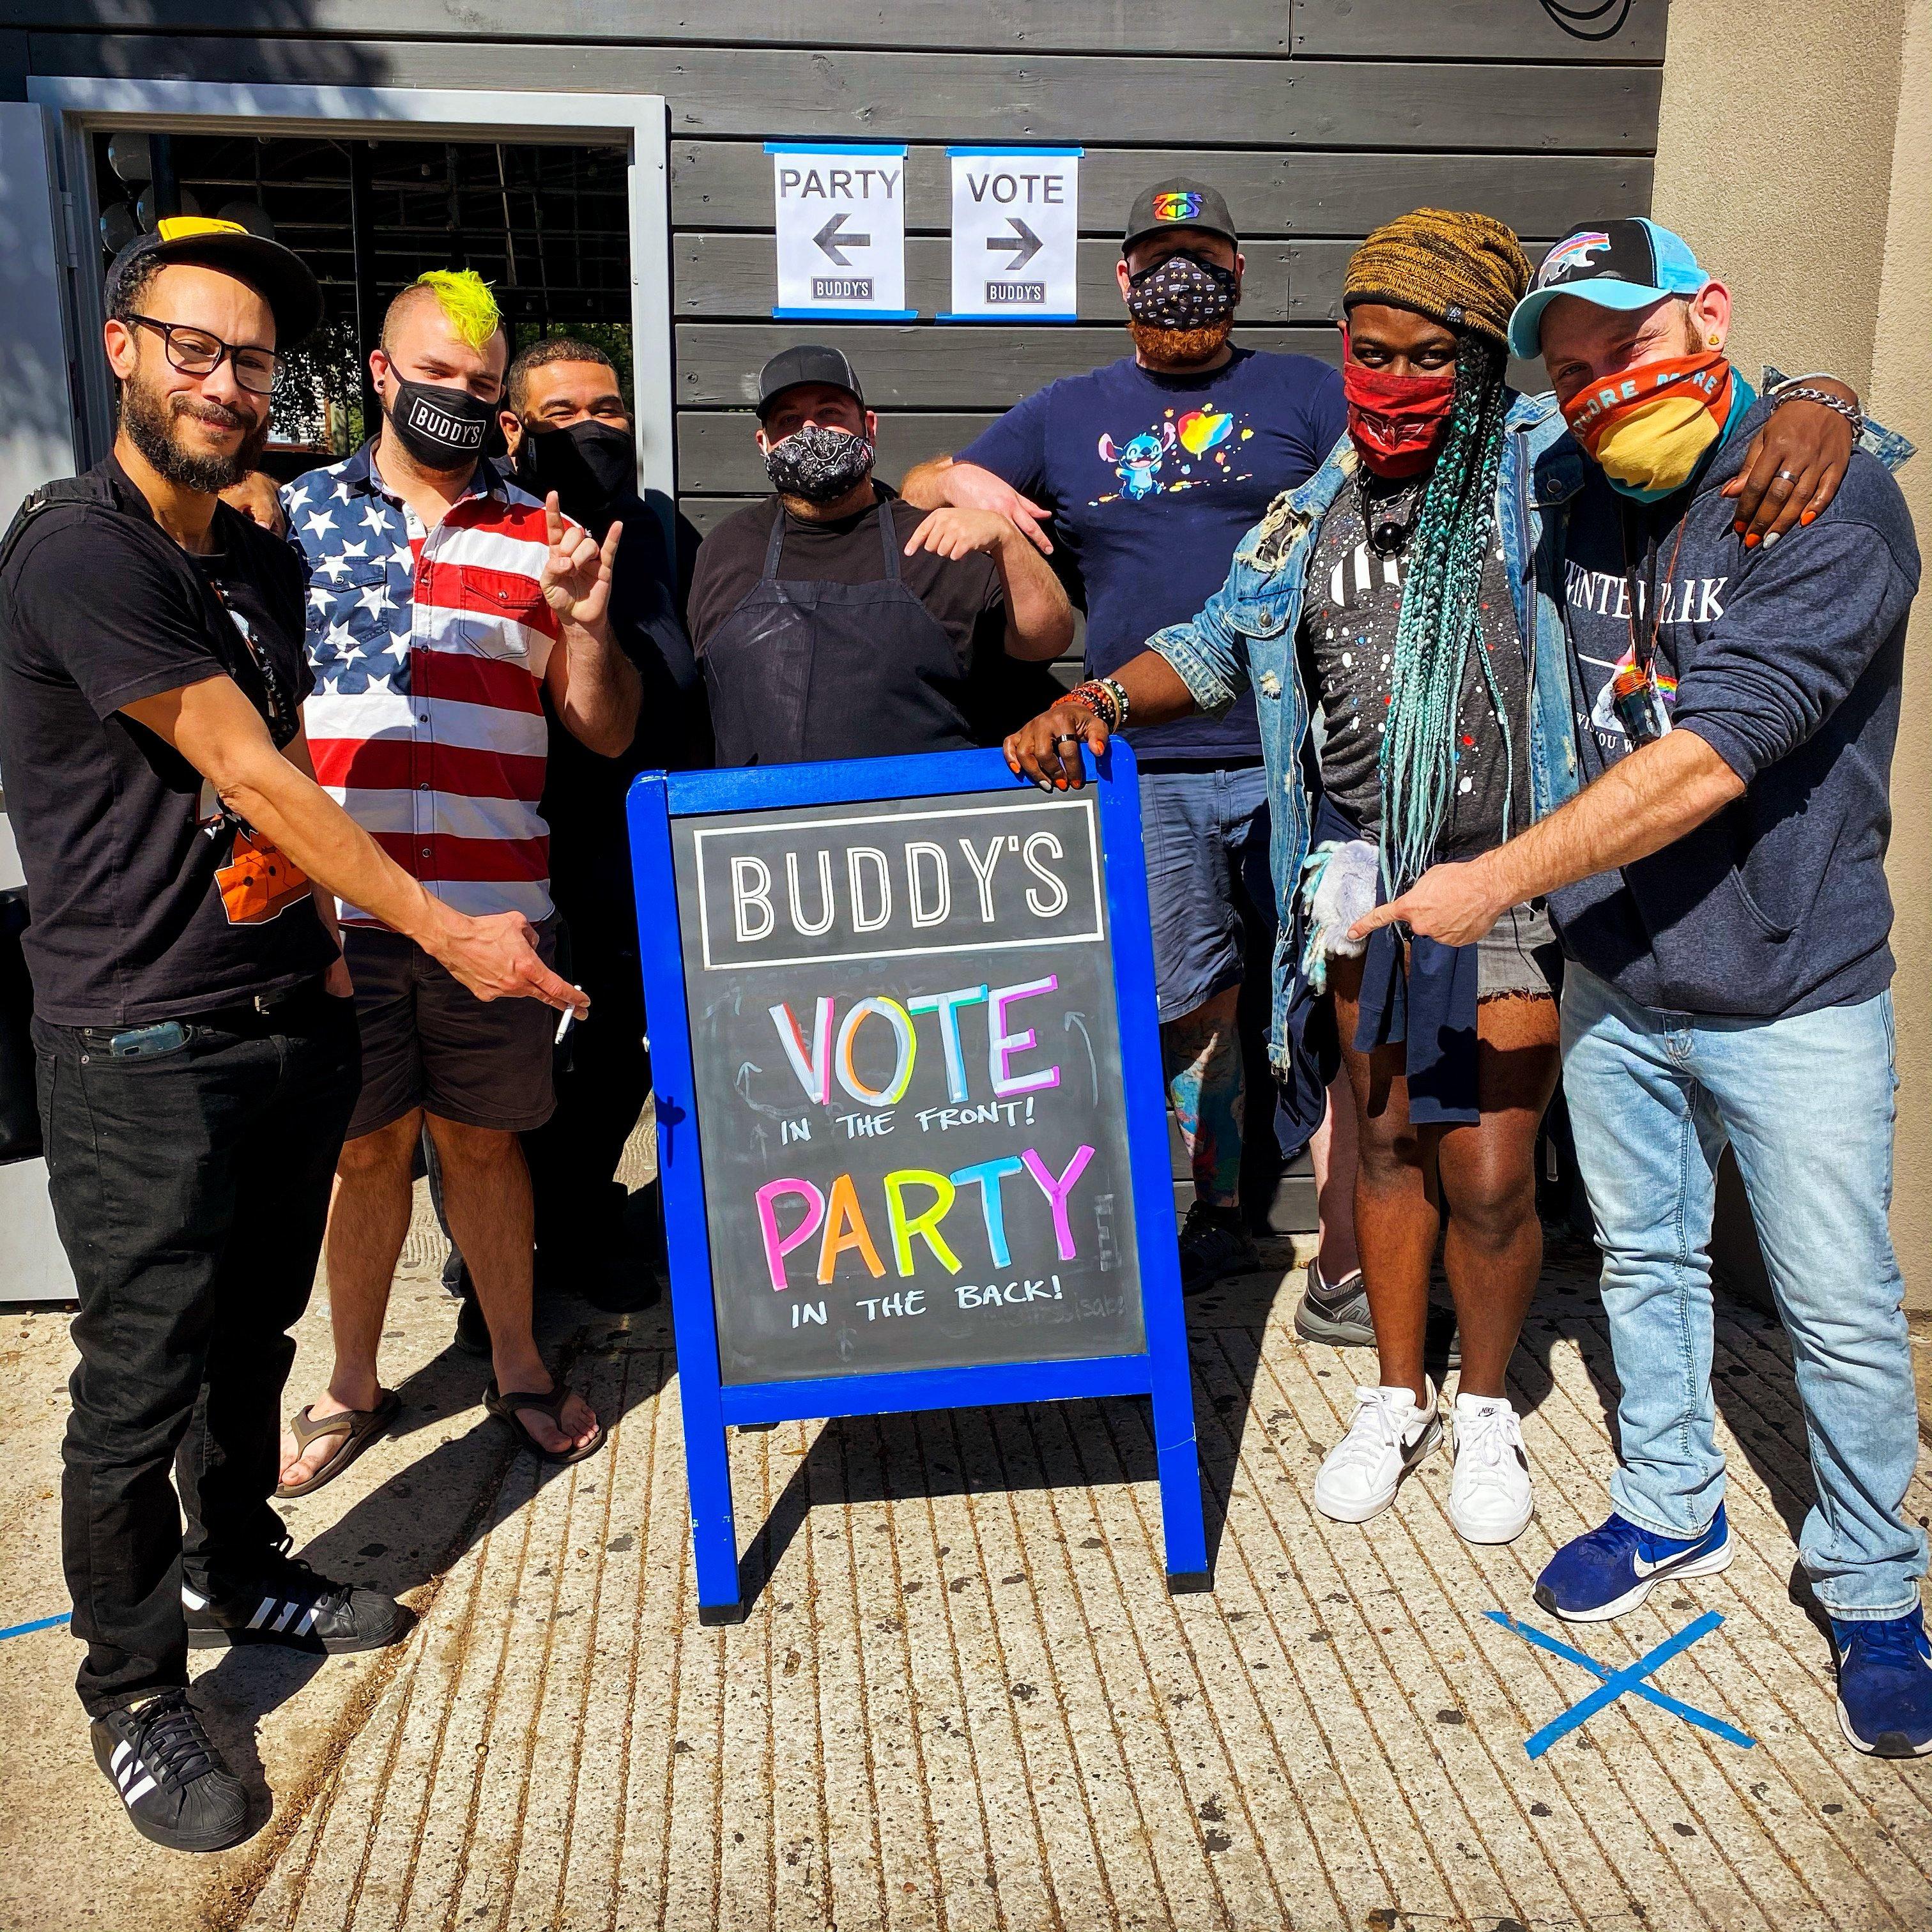 Houston-Gay-Bar-Vote-Polling-Location-Texas-BUDDYS-20201103-3